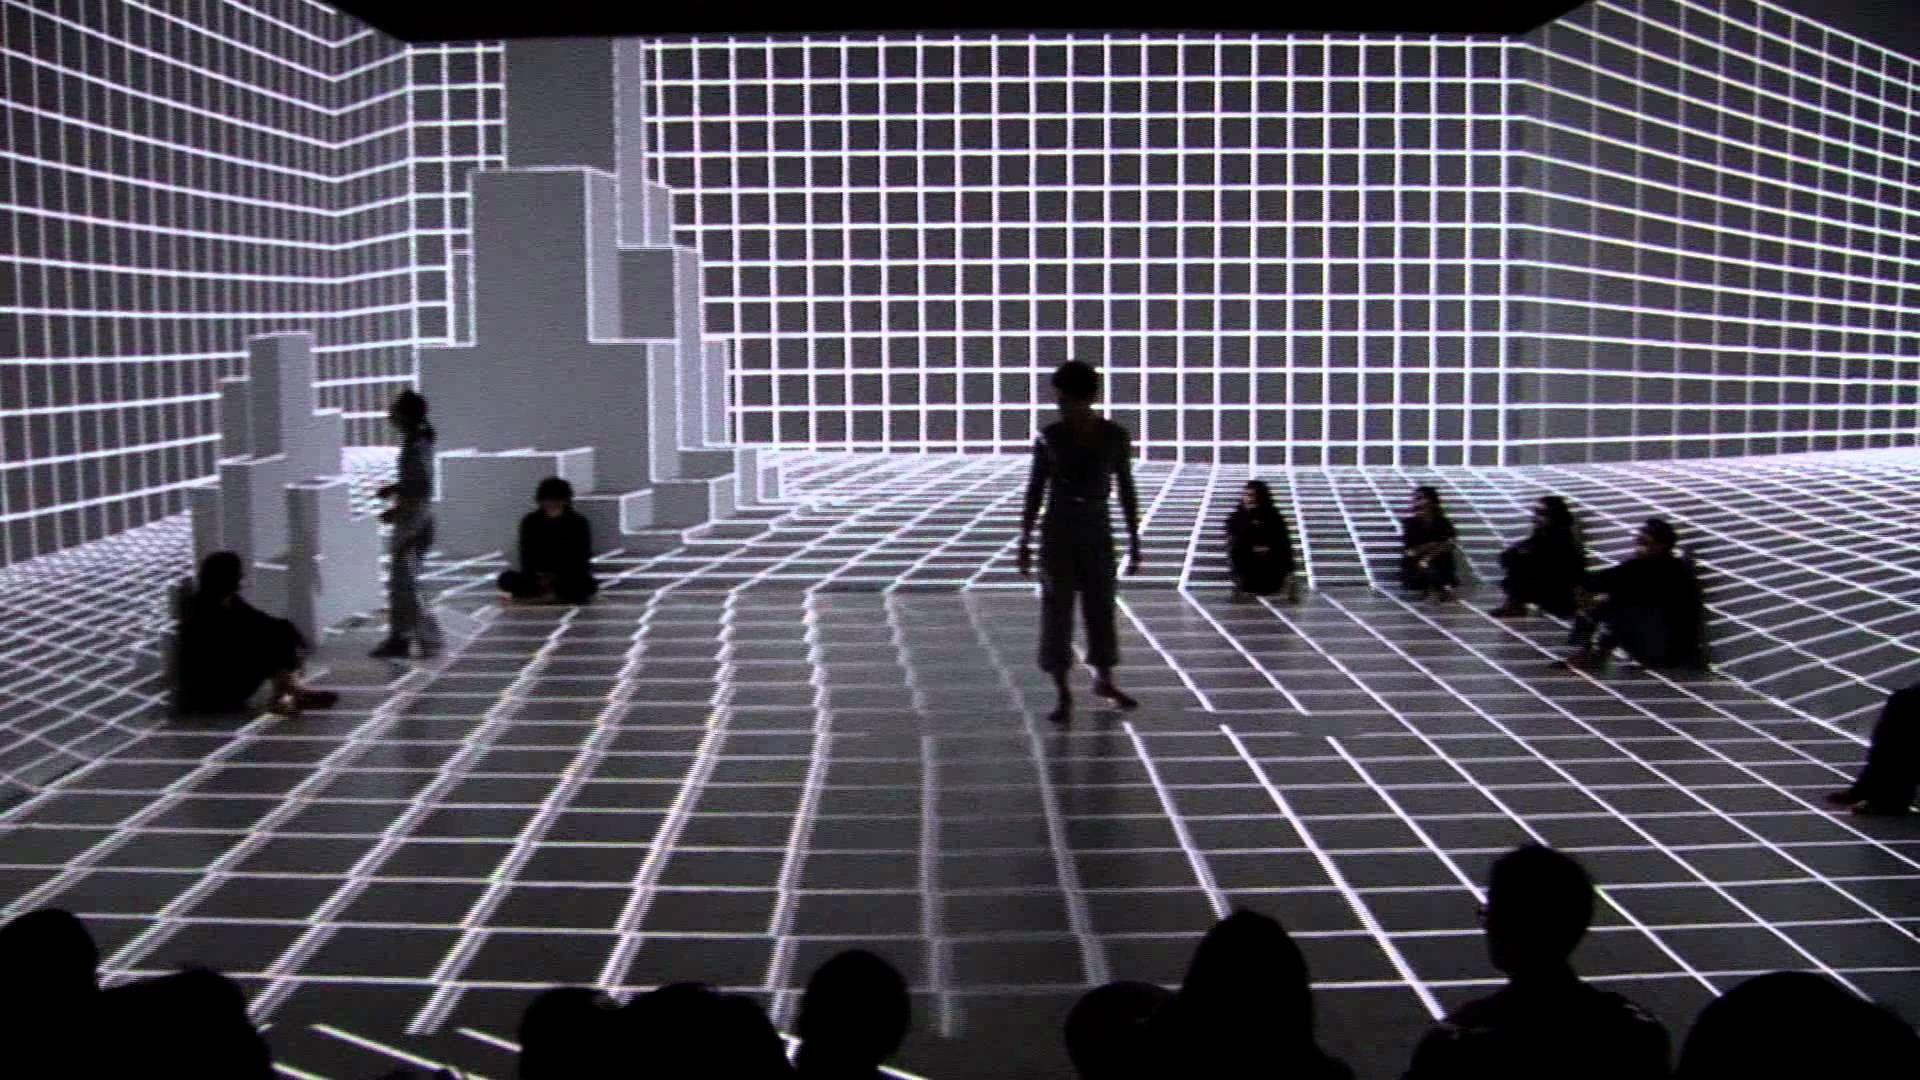 Anarchy Dance Theatre + Ultra Combos 安娜琪舞蹈劇場 + 叁式 Nov ...